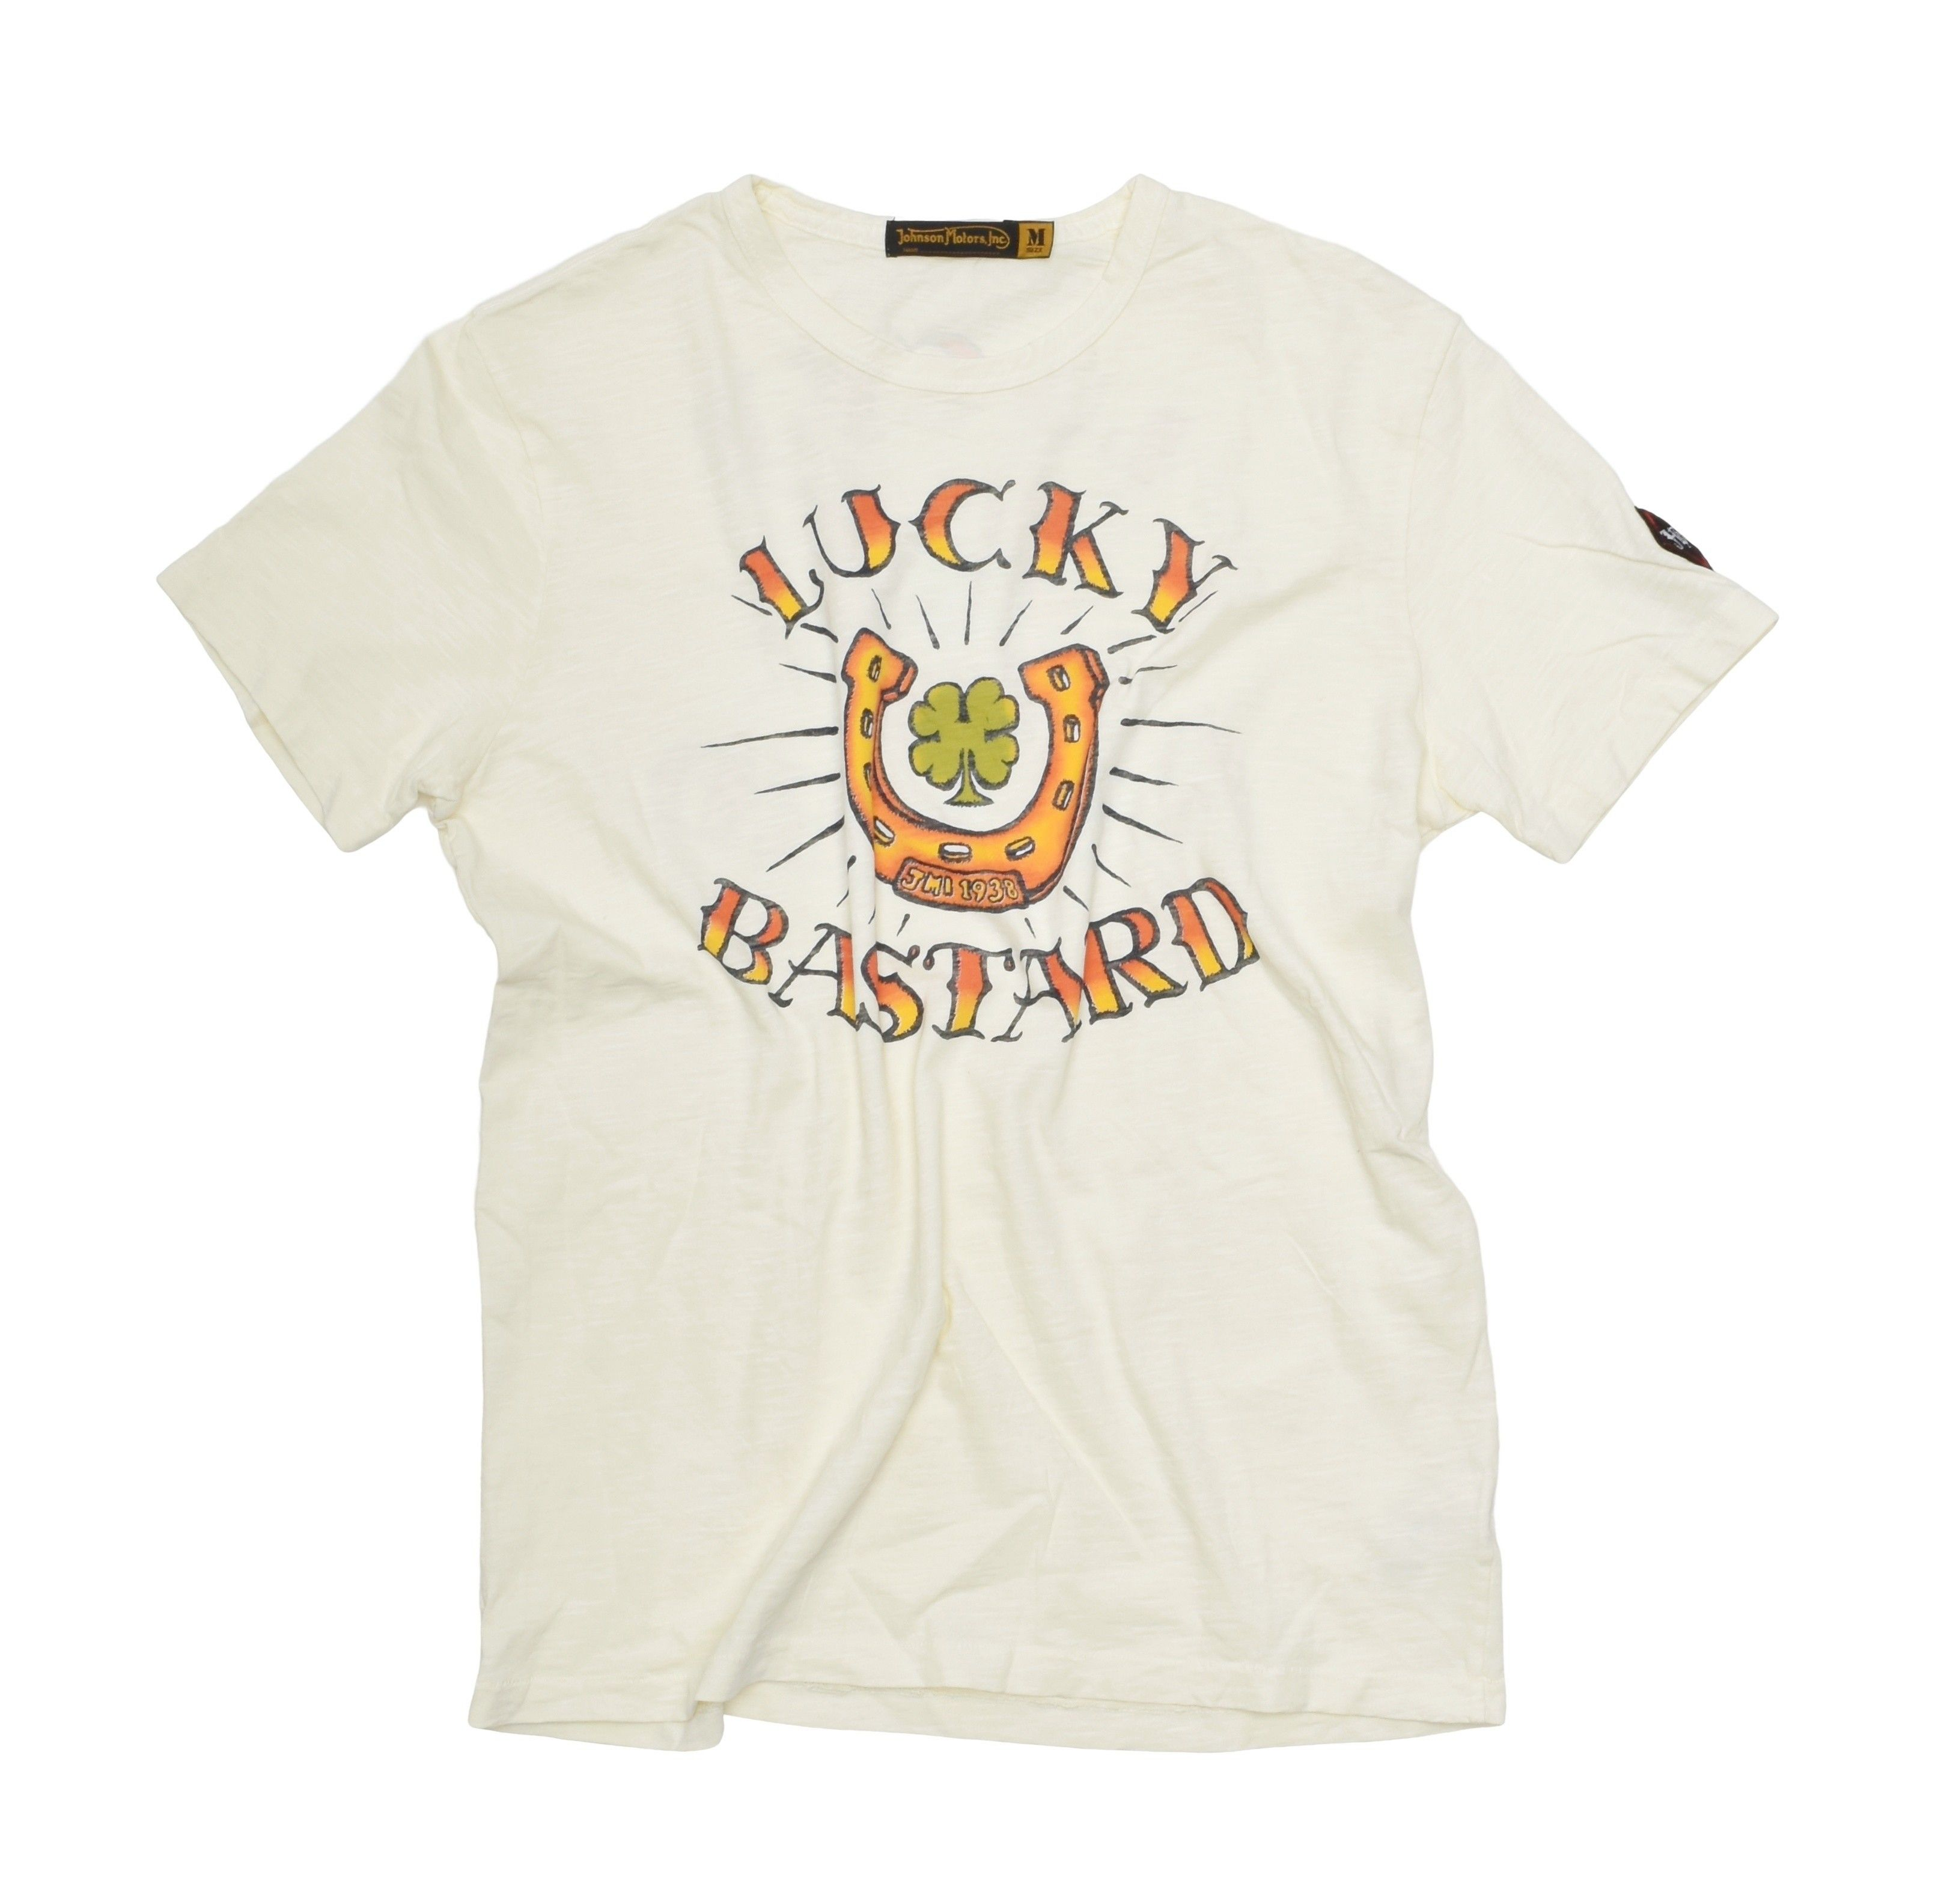 JOHNSON MOTORS - Herren T-Shirt - Lucky Bastard - Yellow Sand